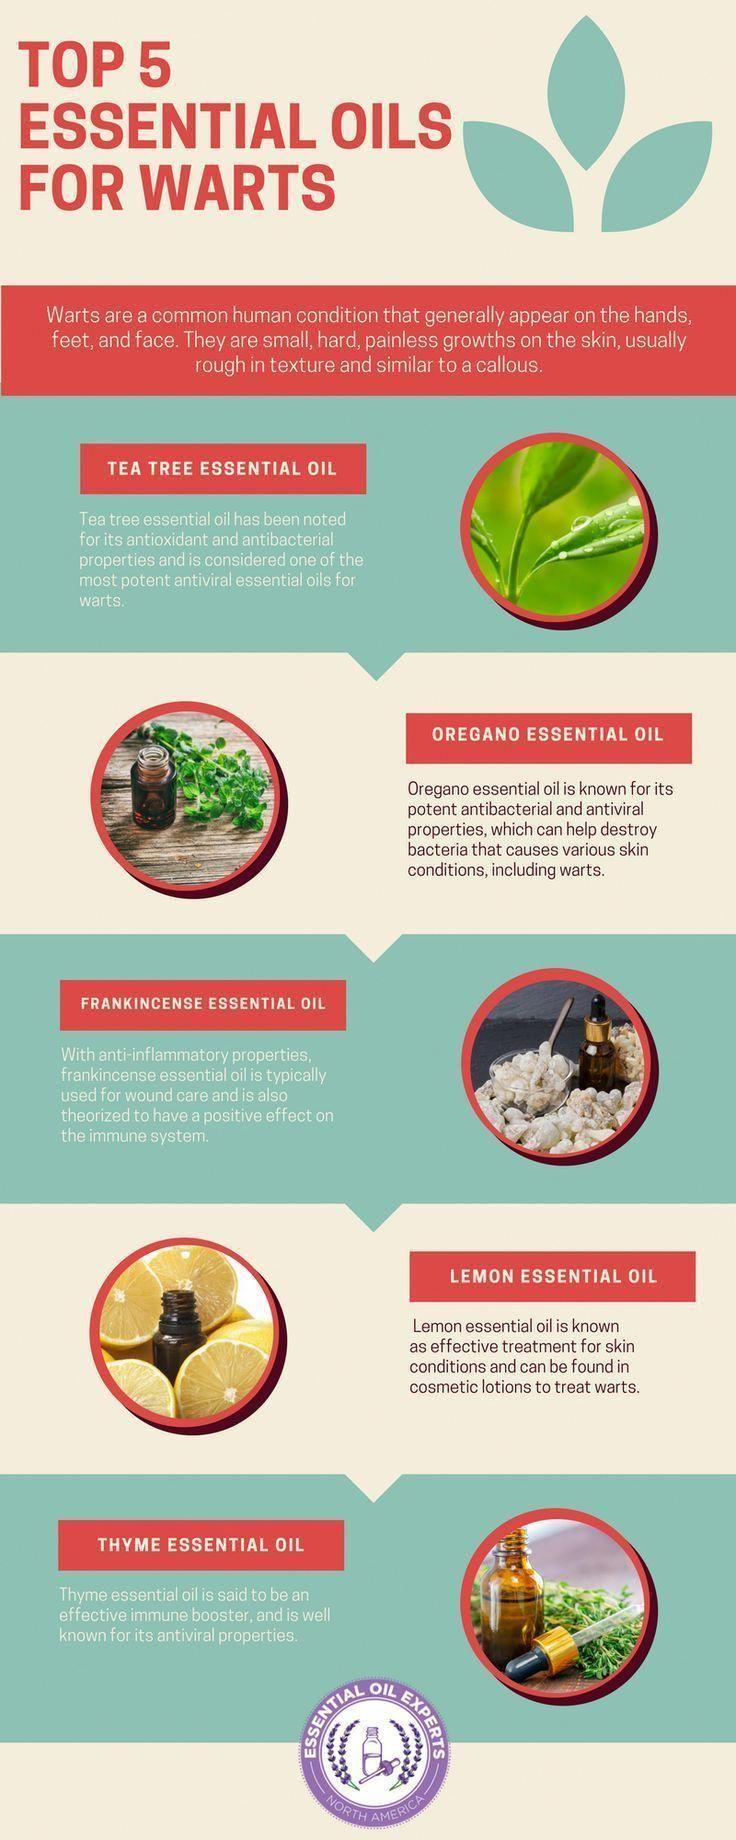 Top 5 Essential Oils for Warts - How to Get Rid of Warts #Natural#Wellness#HealthyLiving#EssentialOils#Holistic#NaturalRemedies#HealthAndWellness#NaturalHealth#HolisticHealth#AllNatural#CleanLiving#HolisticMedicine #essentialoils   #essentialoilsforbeginn #NaturalRemediesForSoreThroat